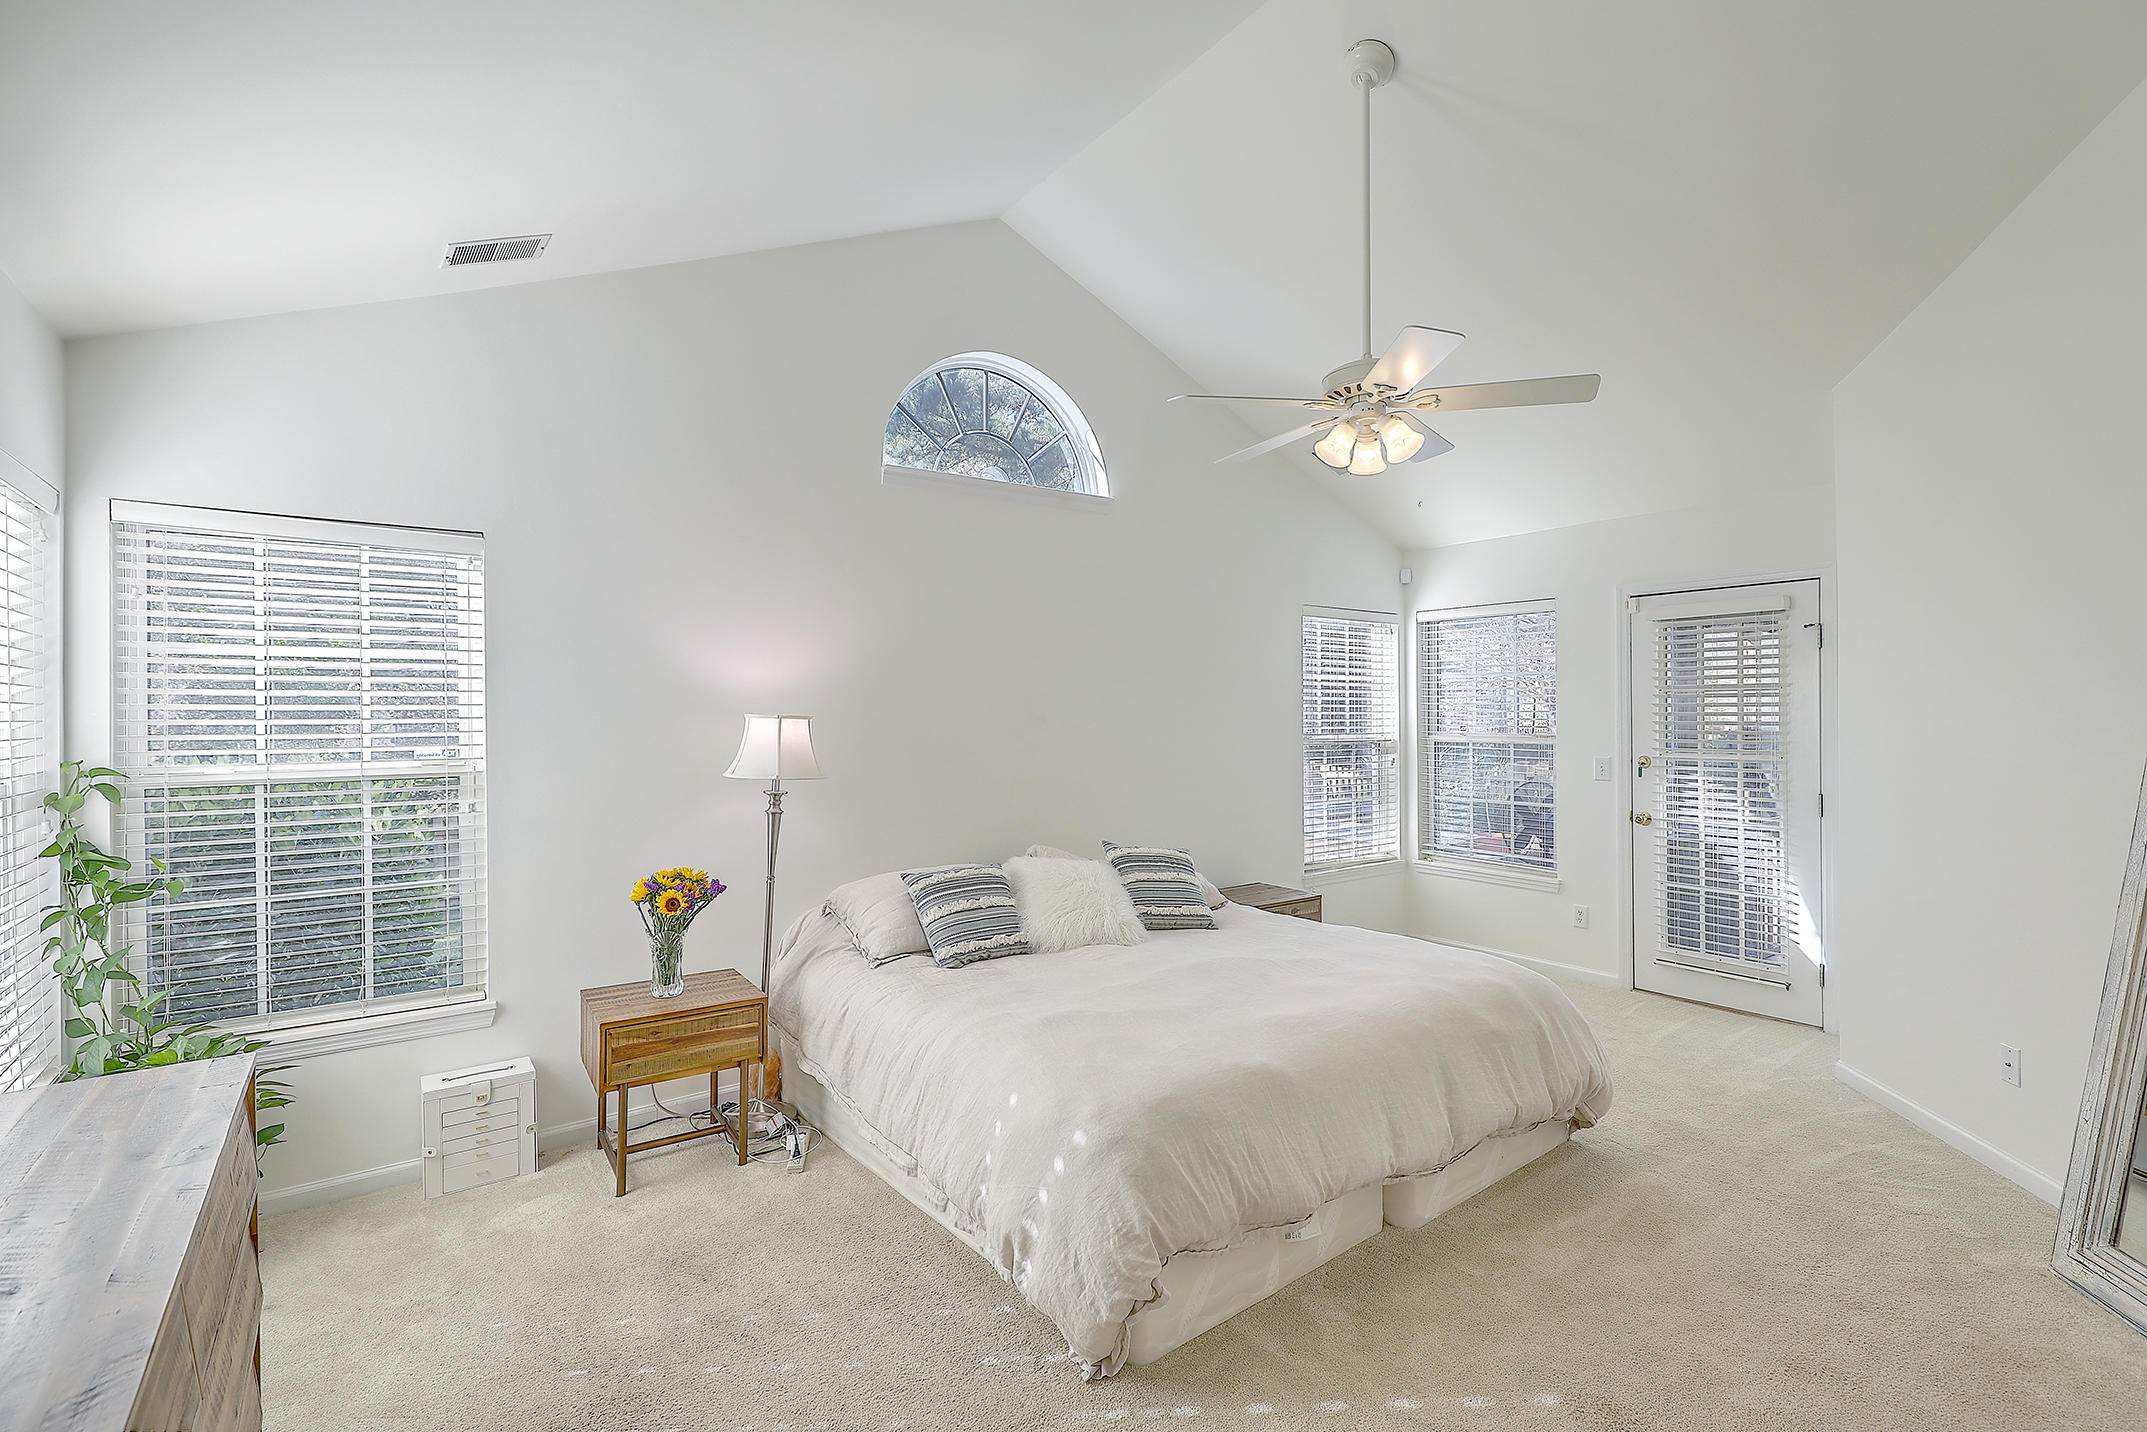 Dunes West Homes For Sale - 1471 Cypress Pointe, Mount Pleasant, SC - 2